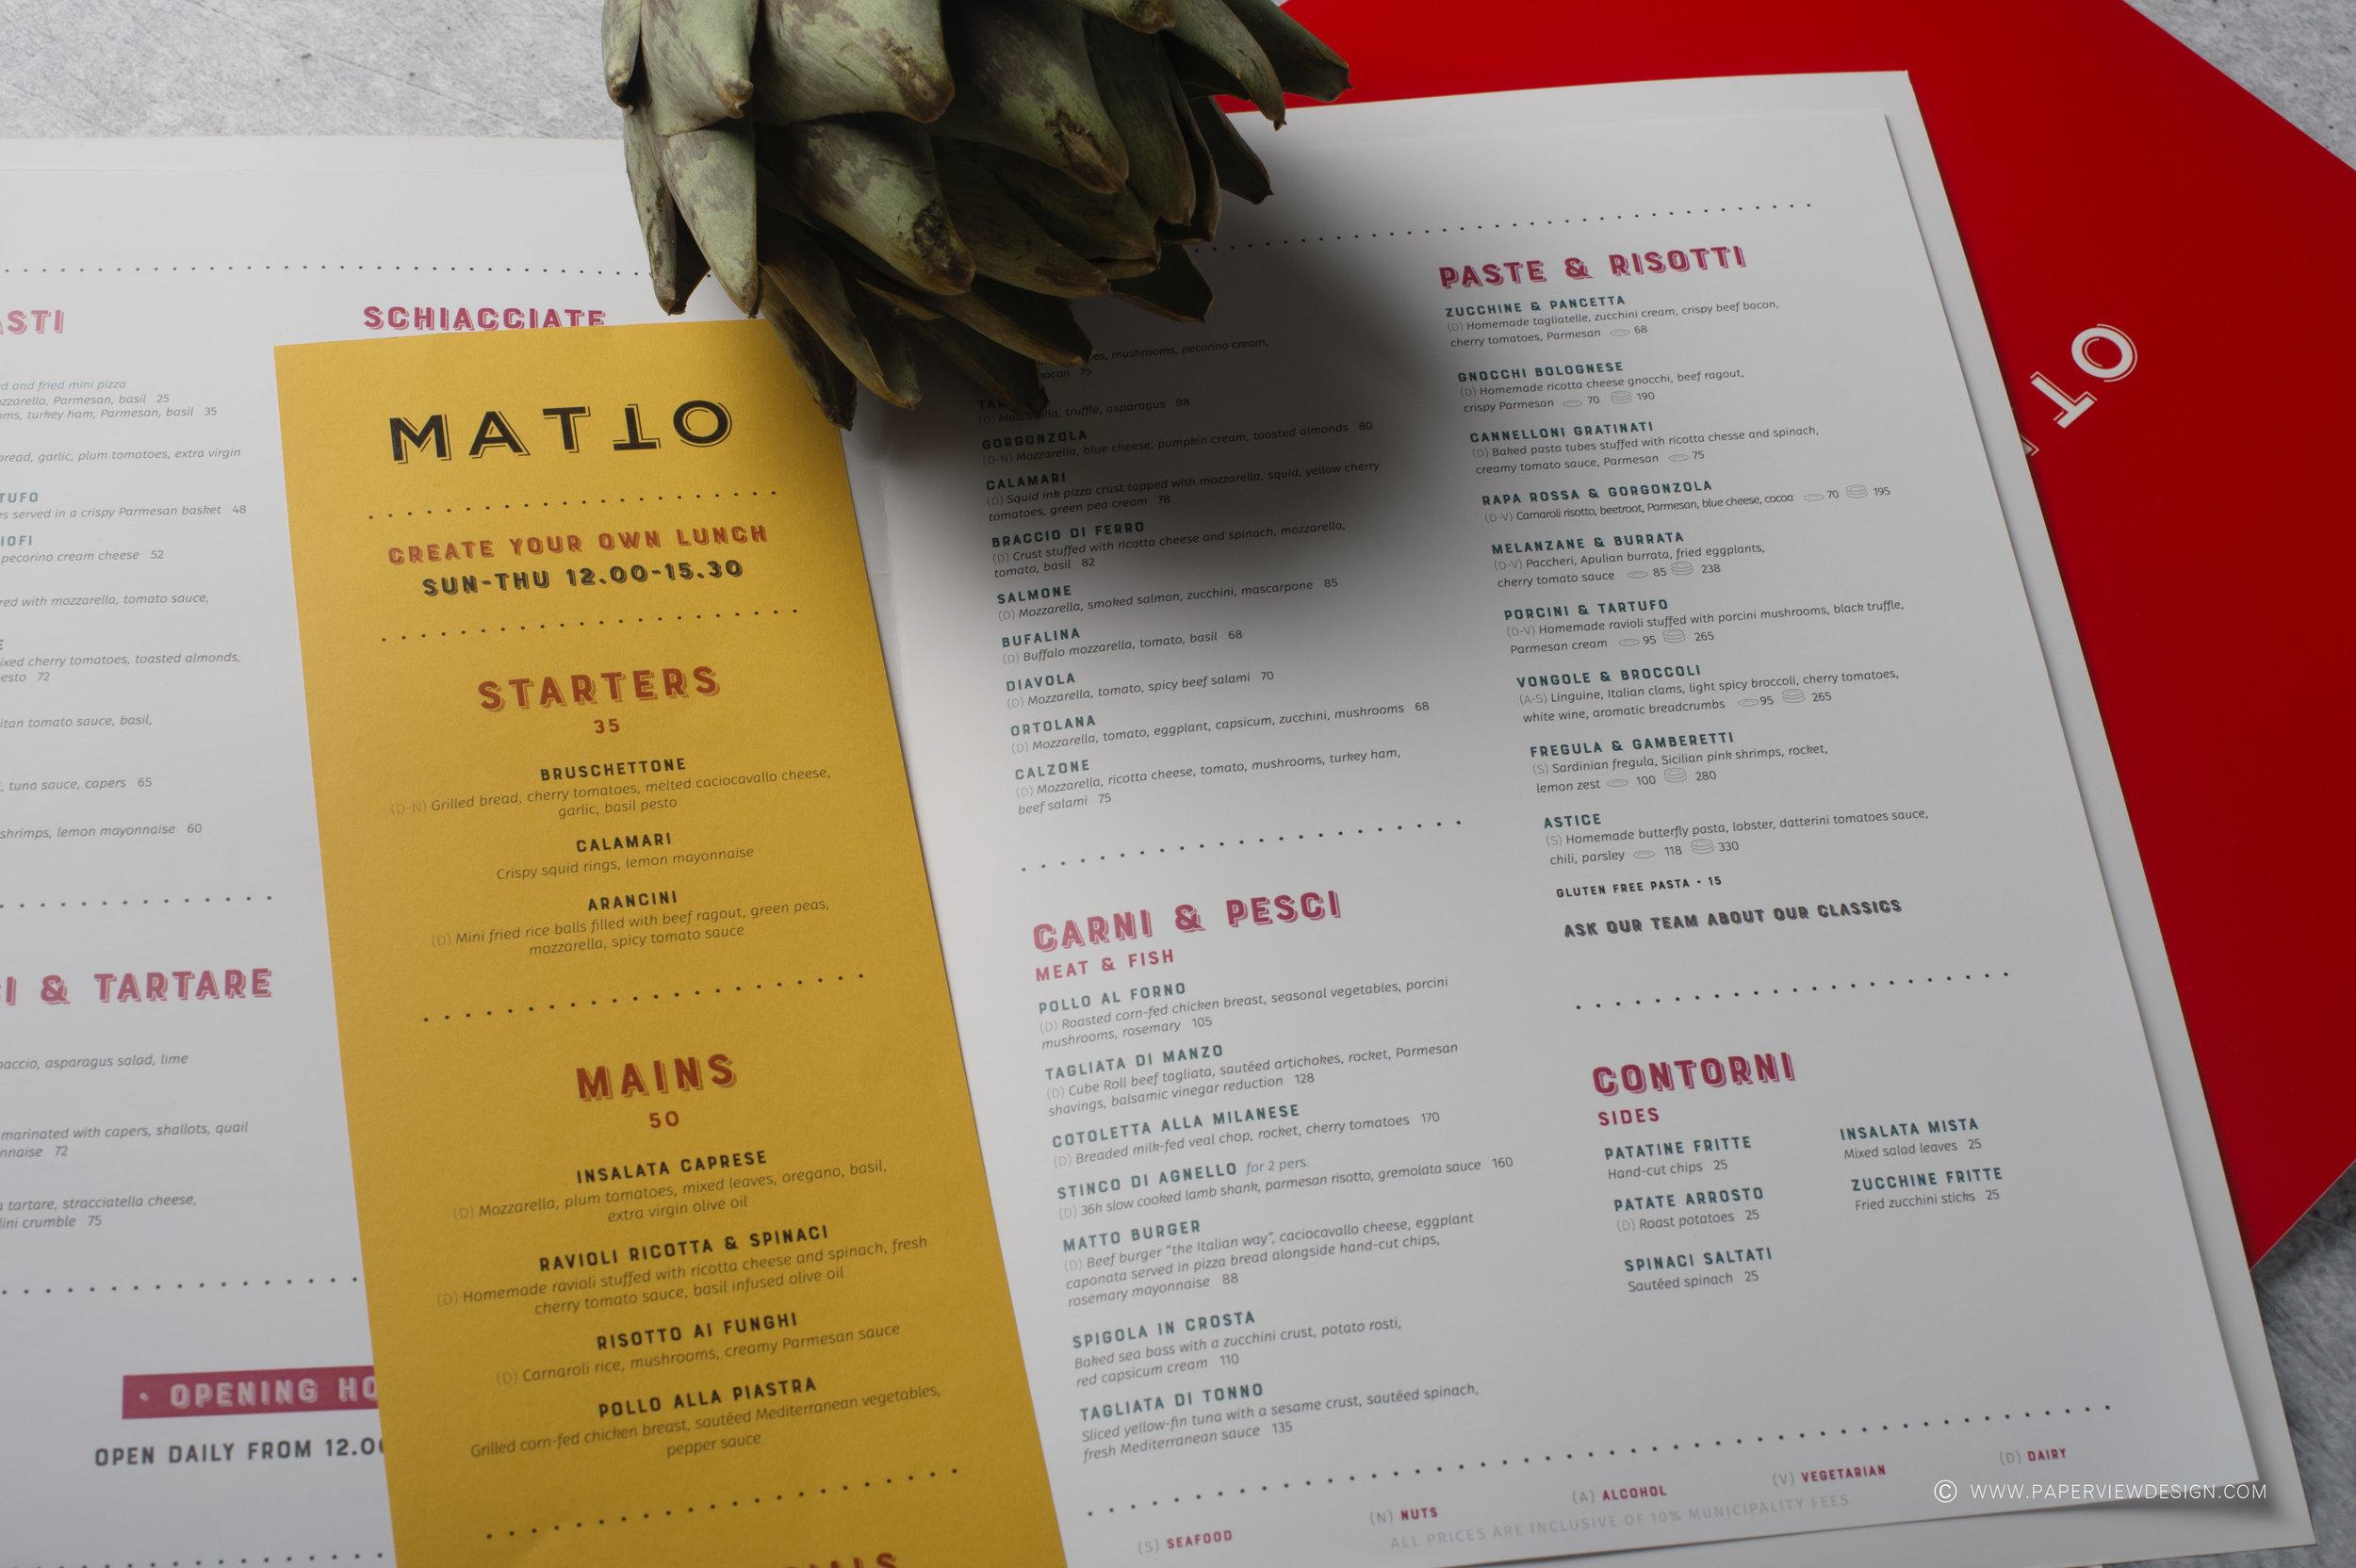 Matto-Inside-Sheets-Menu-Yellow-Pasta-Design-Art-Branding-Restaurant